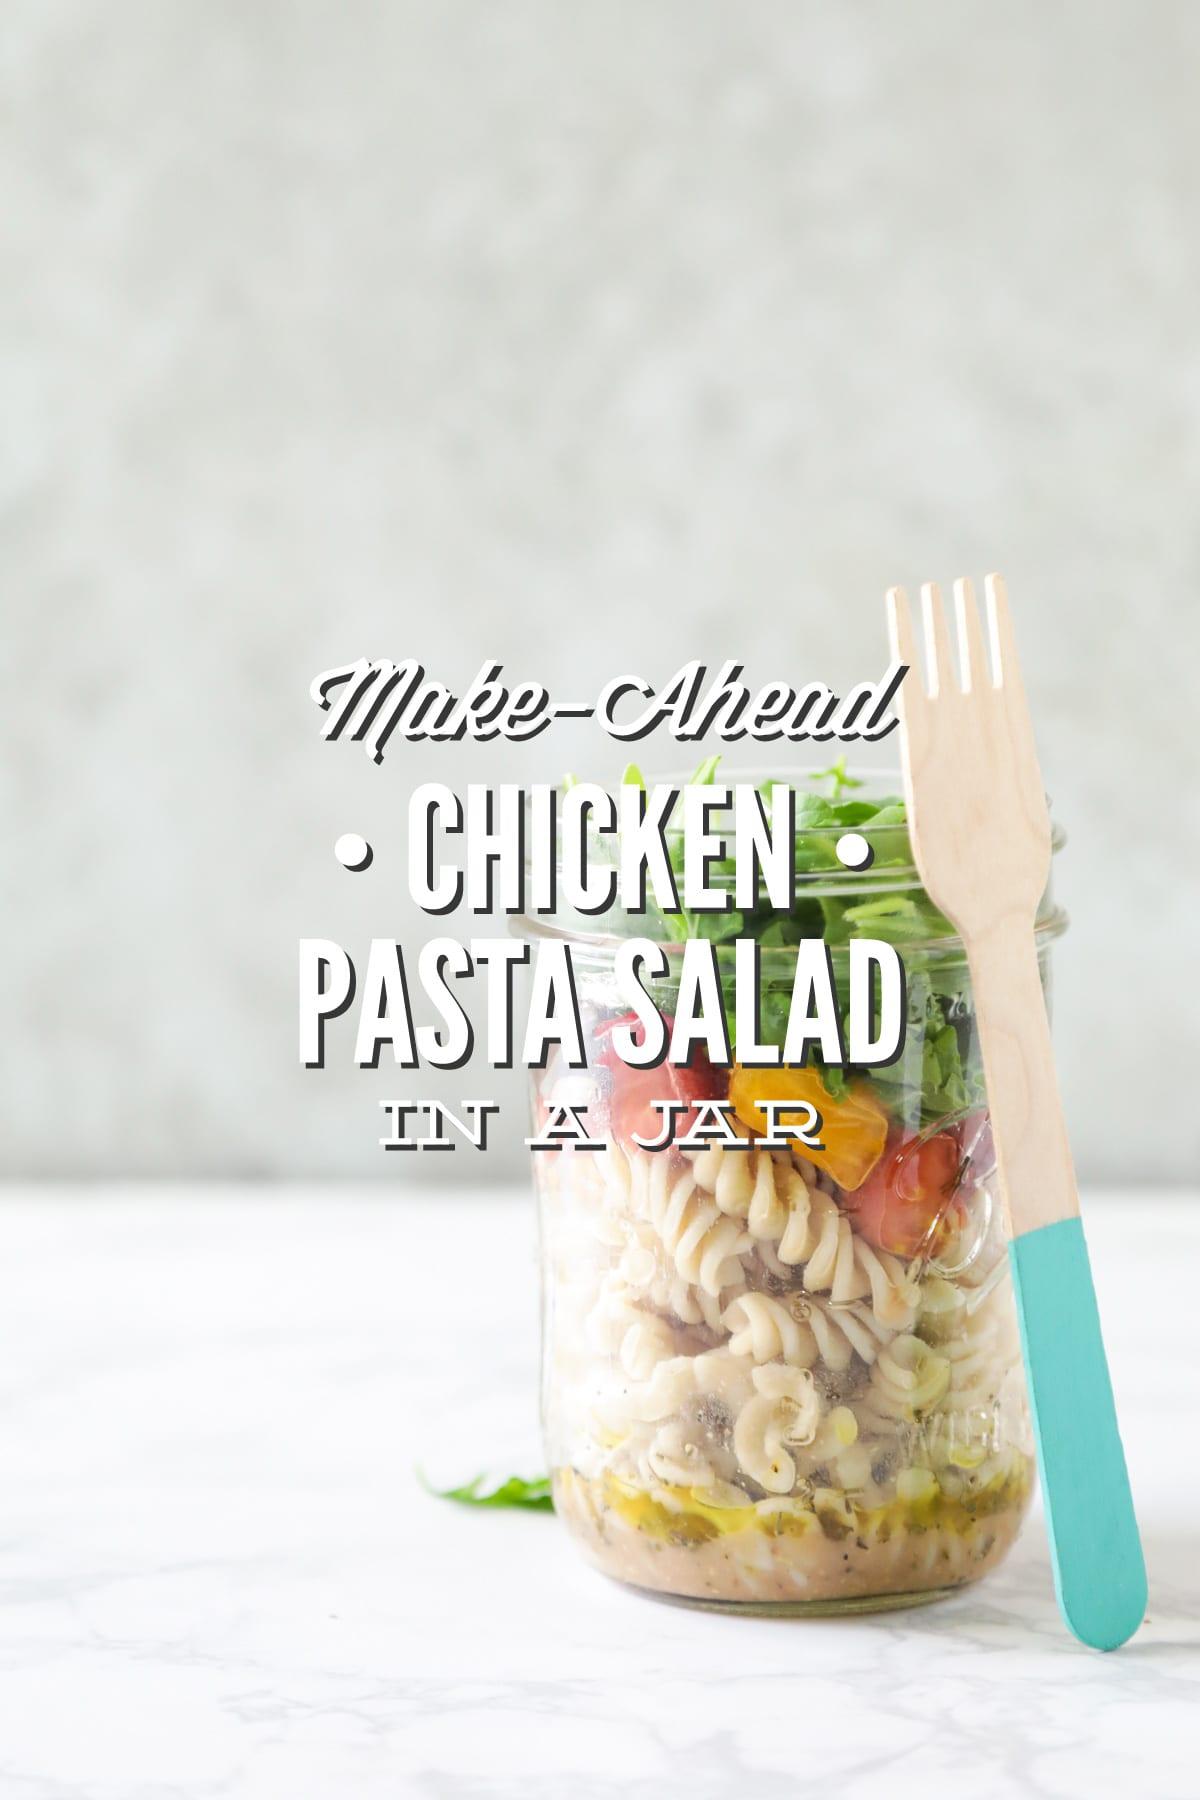 Make-Ahead Chicken Pasta Salad